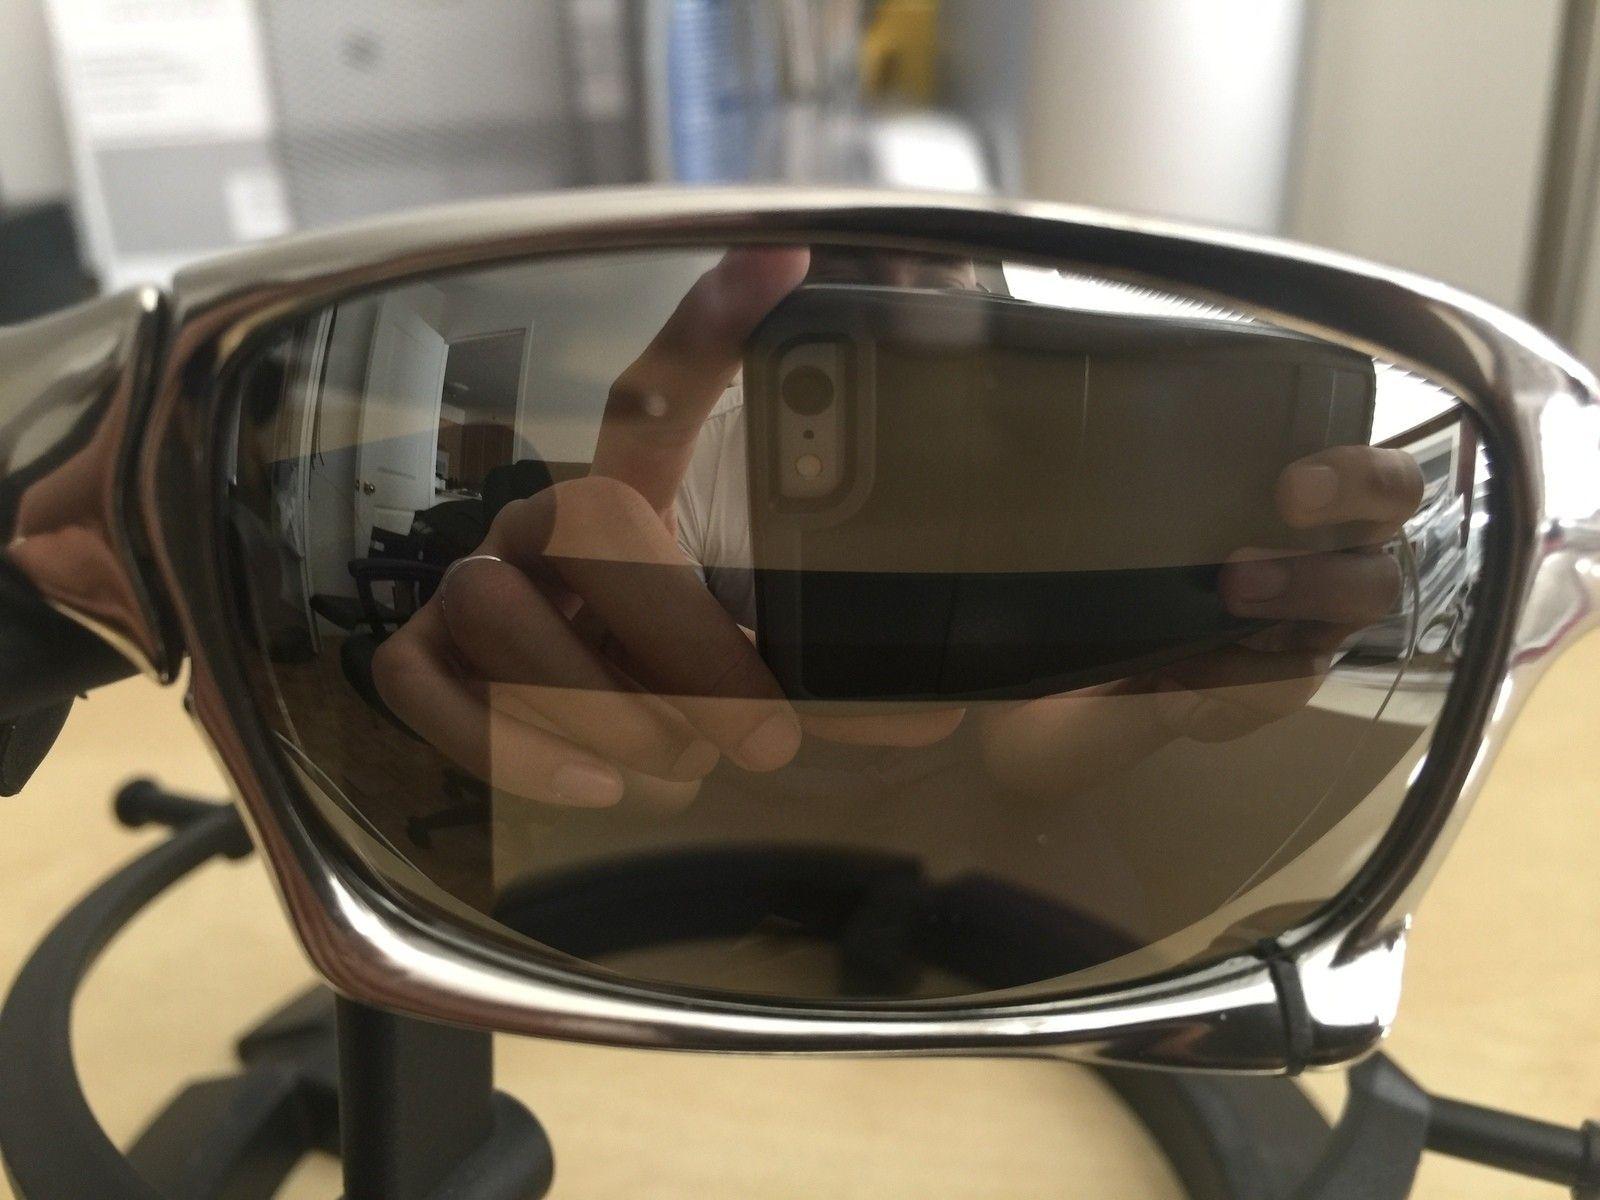 XS Polished with Chrome Polars (mint) with bonus OEM Slate lenses - $550 Shipped - IMG_4930.JPG